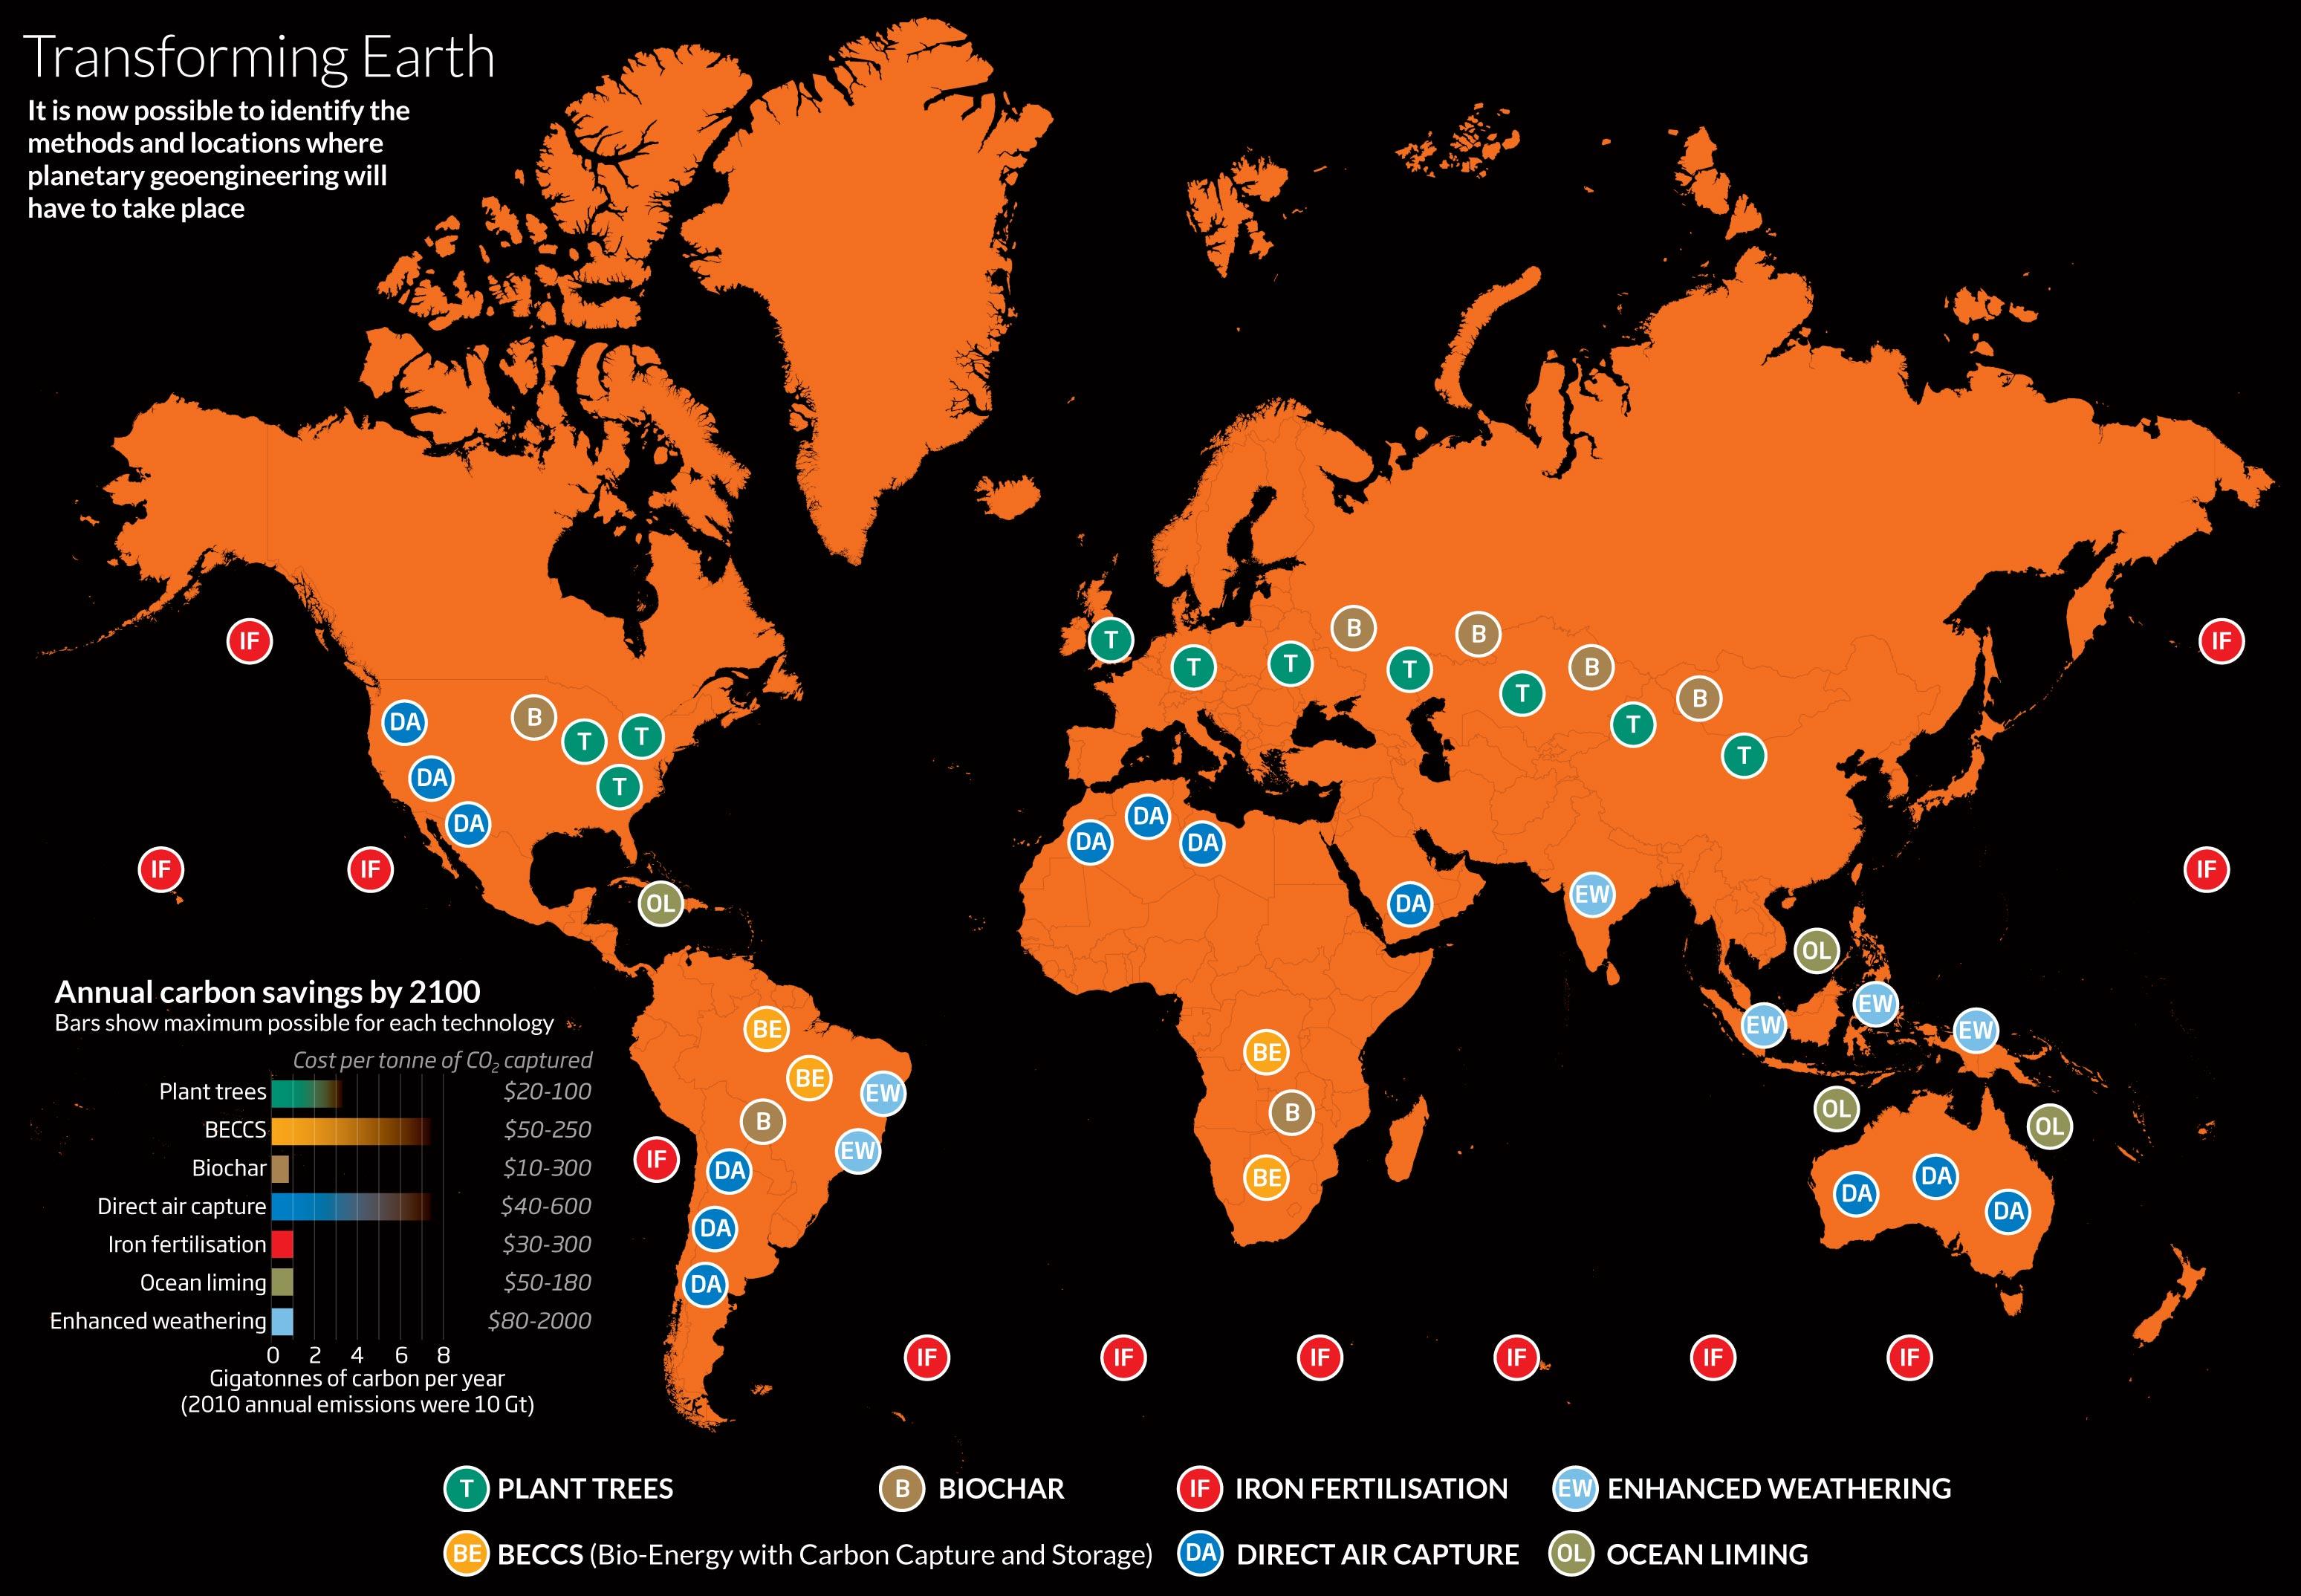 http://www.newscientist.com/article/mg22029382.500-terraforming-earth-geoengineering-megaplan-starts-now.html